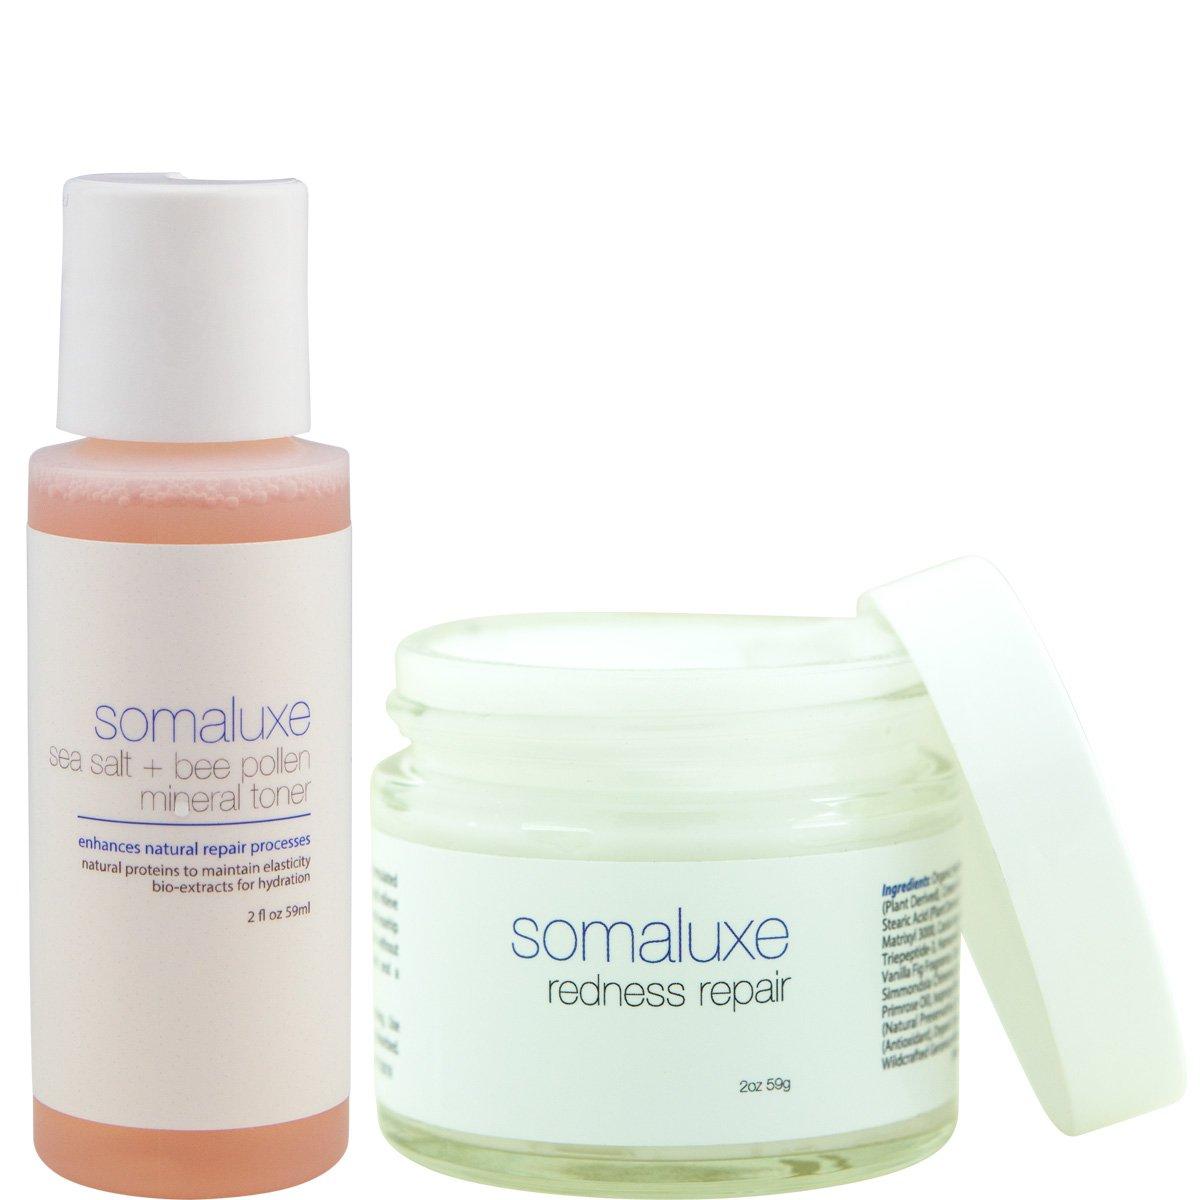 Sea Salt + Bee Pollen Mineral Toner w/ natural proteins for closing pores & improving elasticity Prestige Cosmetics, Skin Loving Minerals Eyeliner, Onyx, .035 oz (pack of 4)